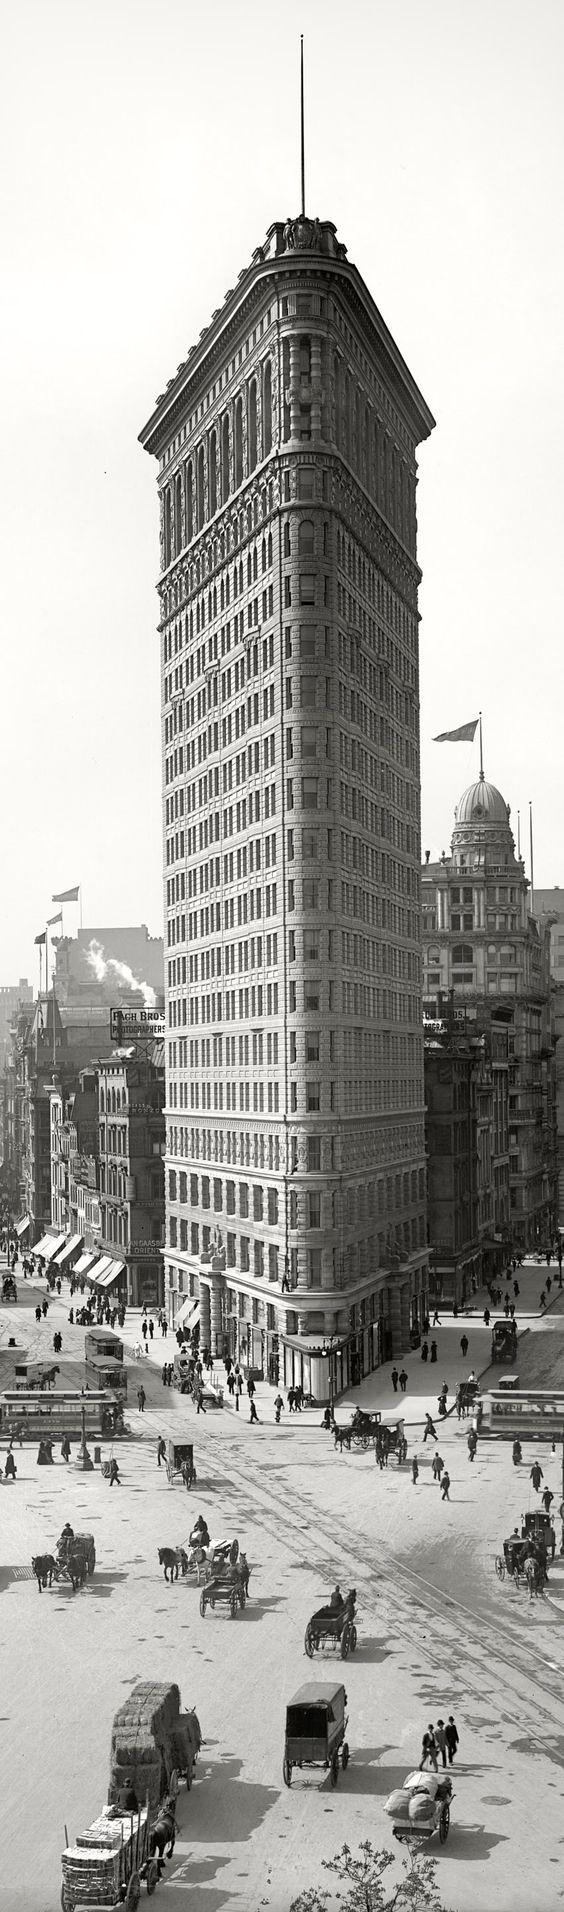 HISTORIC LANDMARK: Flatiron Building, New York City (1902)